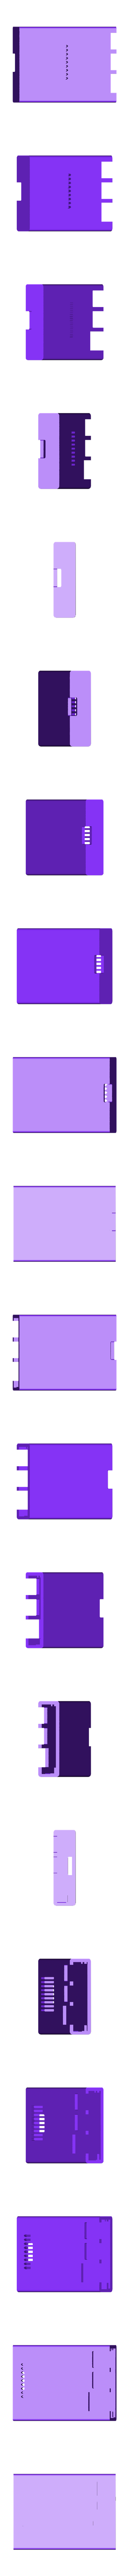 Raspberry_Pi_3B%2B_Sleeve.Sleeve.Body1-Pi-hole.stl Télécharger fichier STL gratuit Raspberry Pi 3B+ Sleeve • Design à imprimer en 3D, Wilko